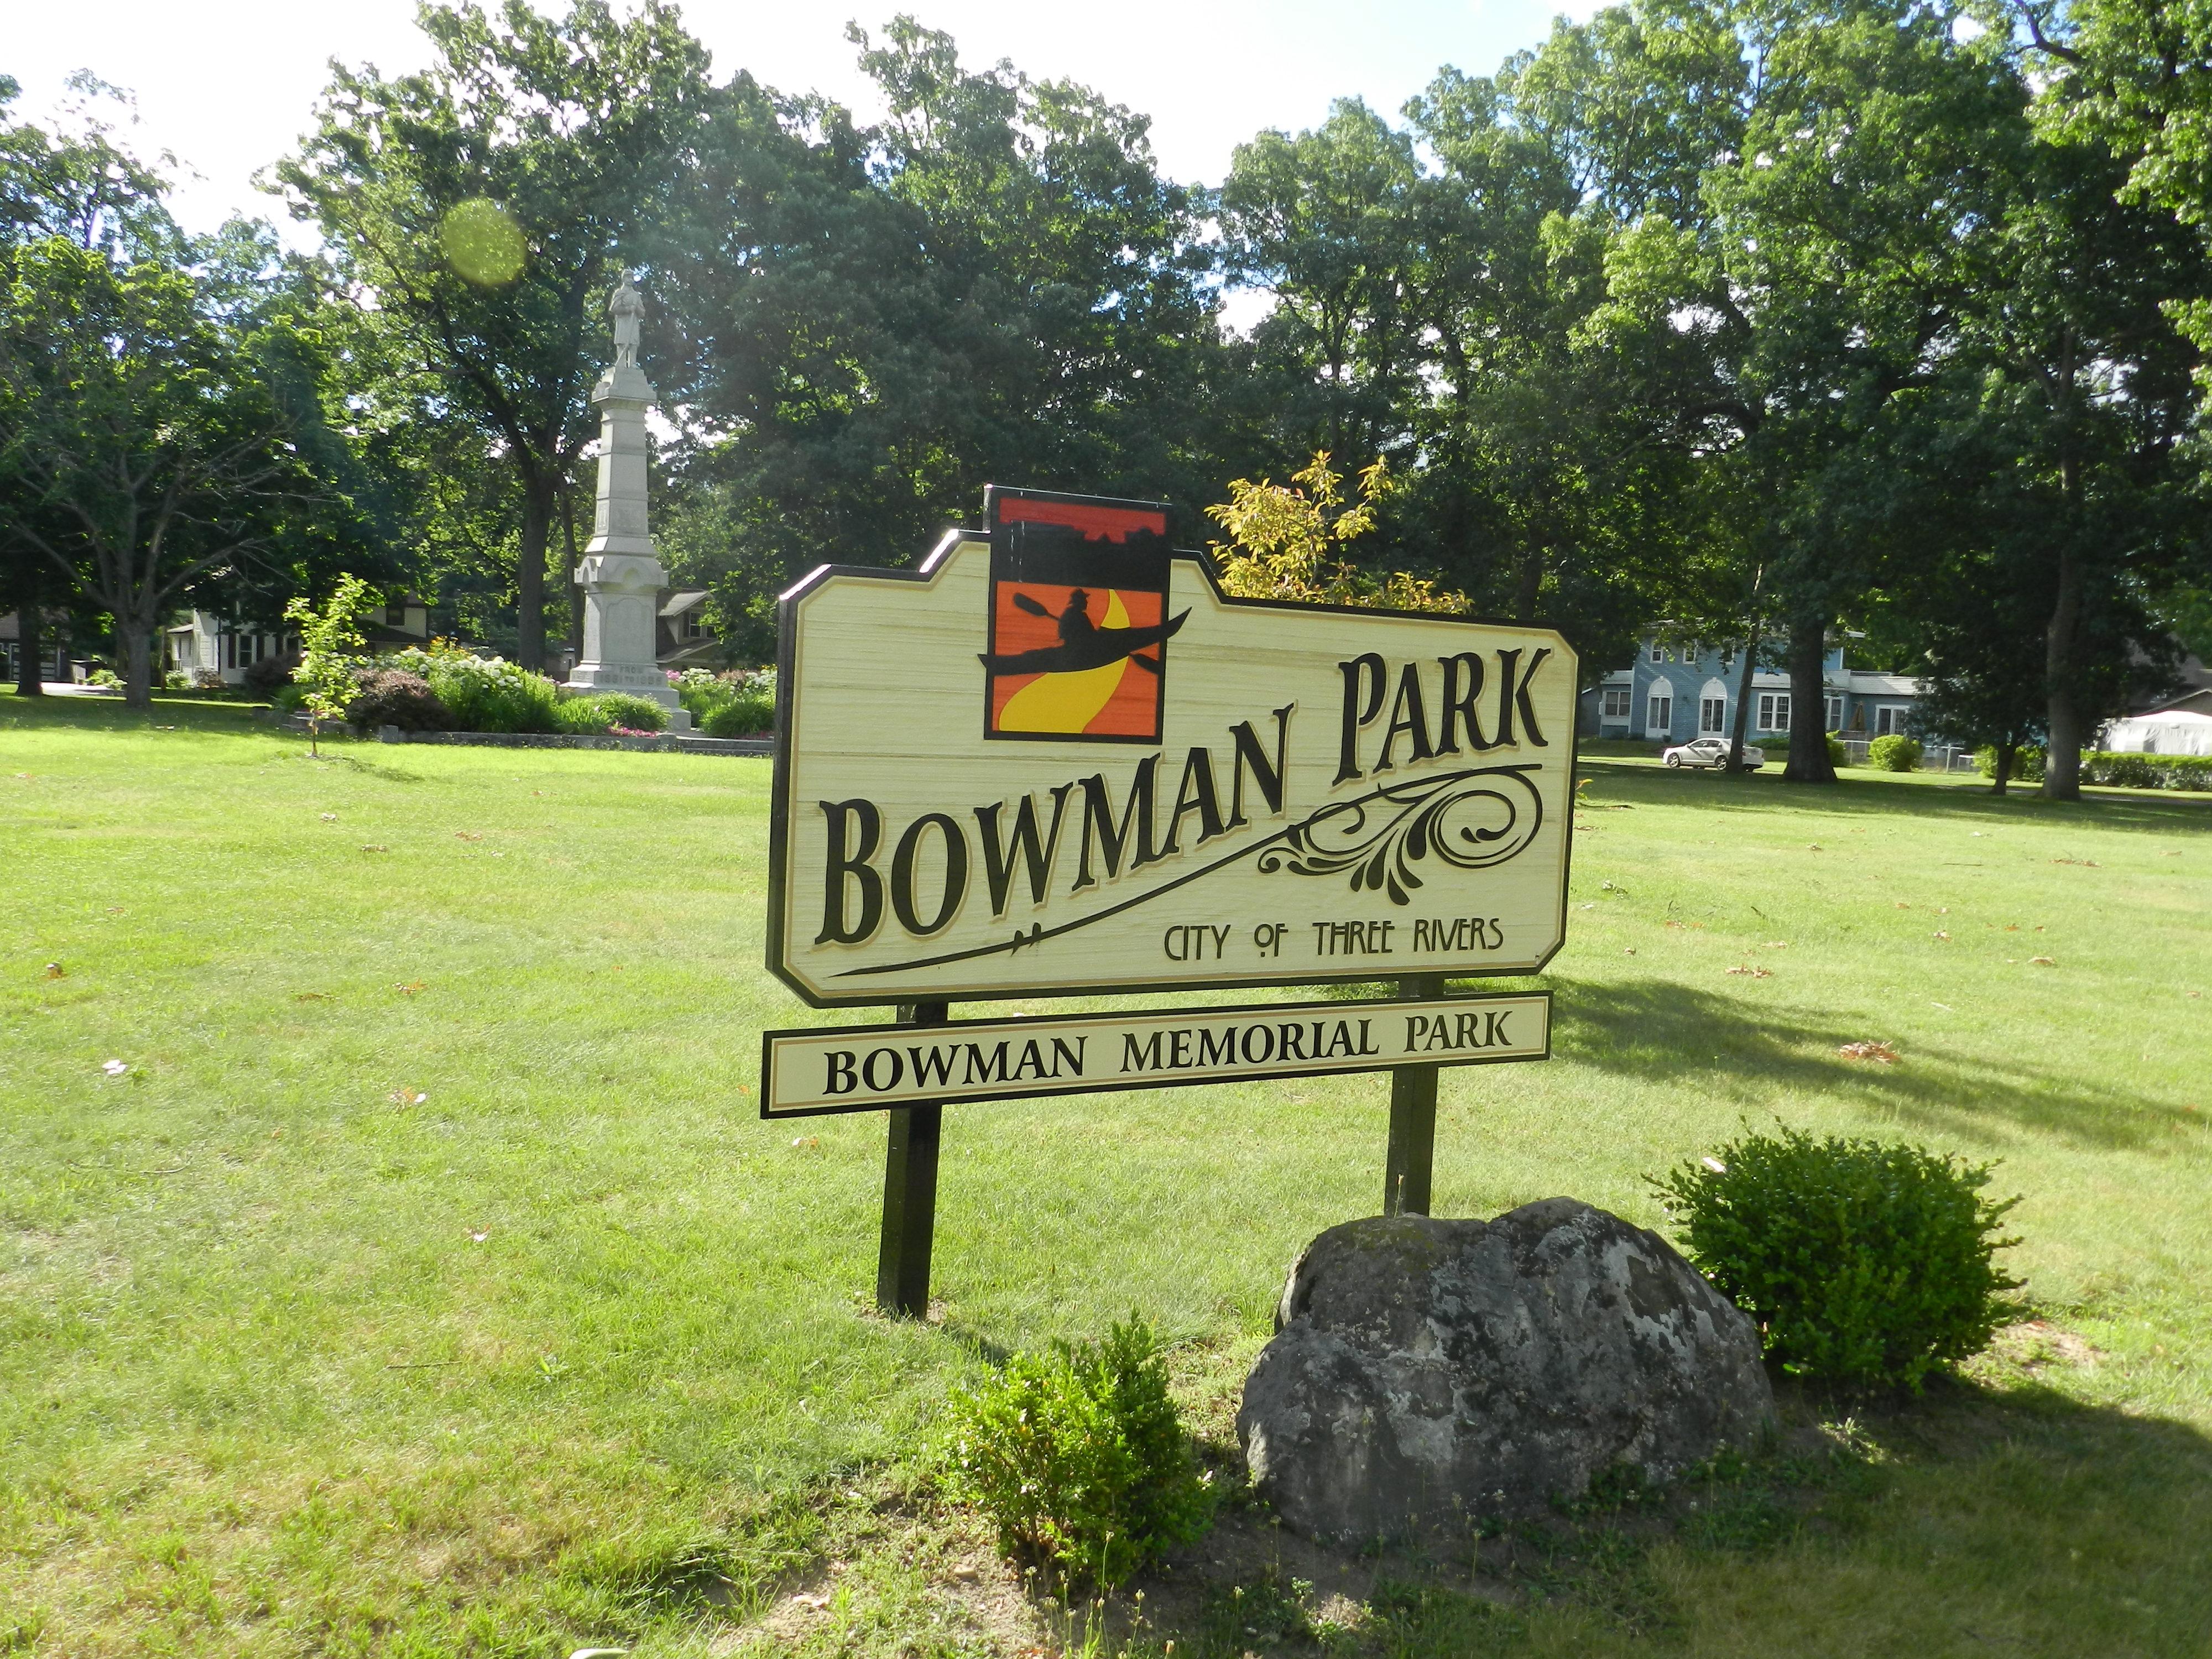 Bowman Memorial Park Sign (from flicker.com)